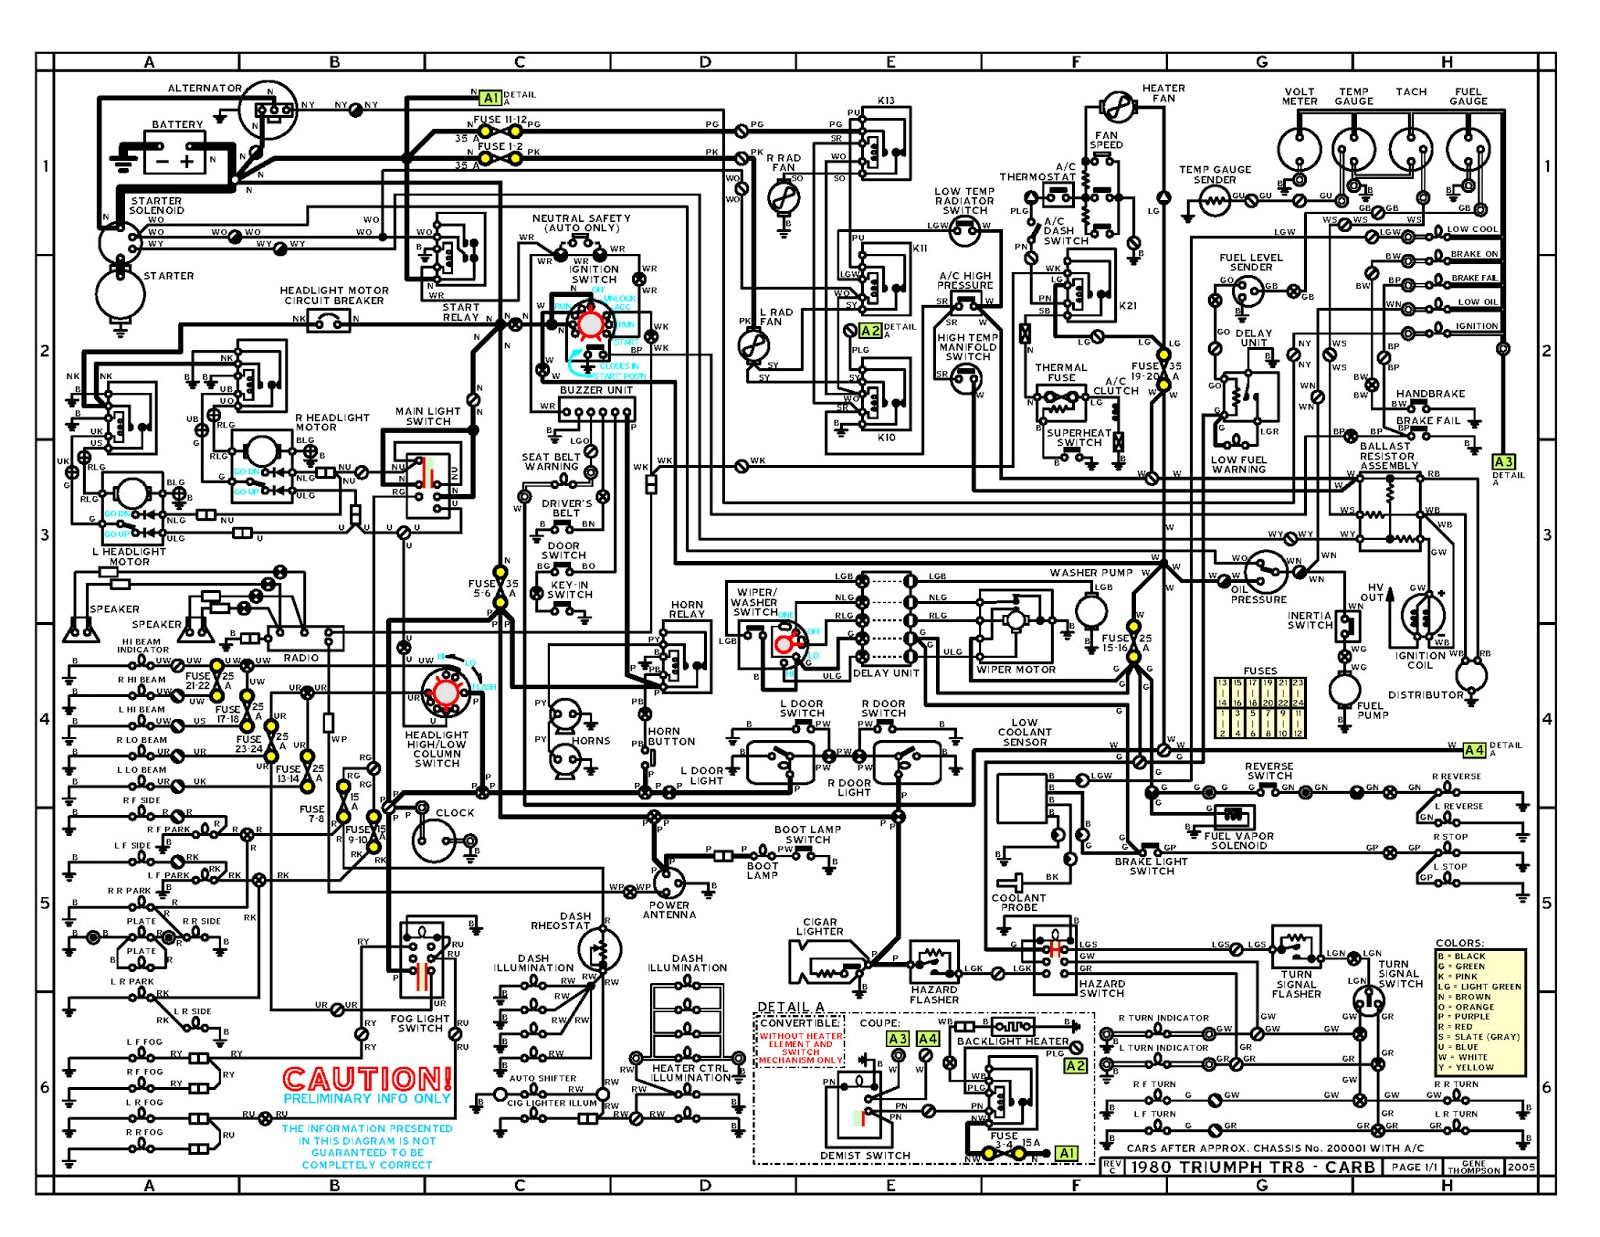 Triumph Spitfire Wiring Diagram 1600 Free Download 1974 74 Tr6 1967 Tr4a